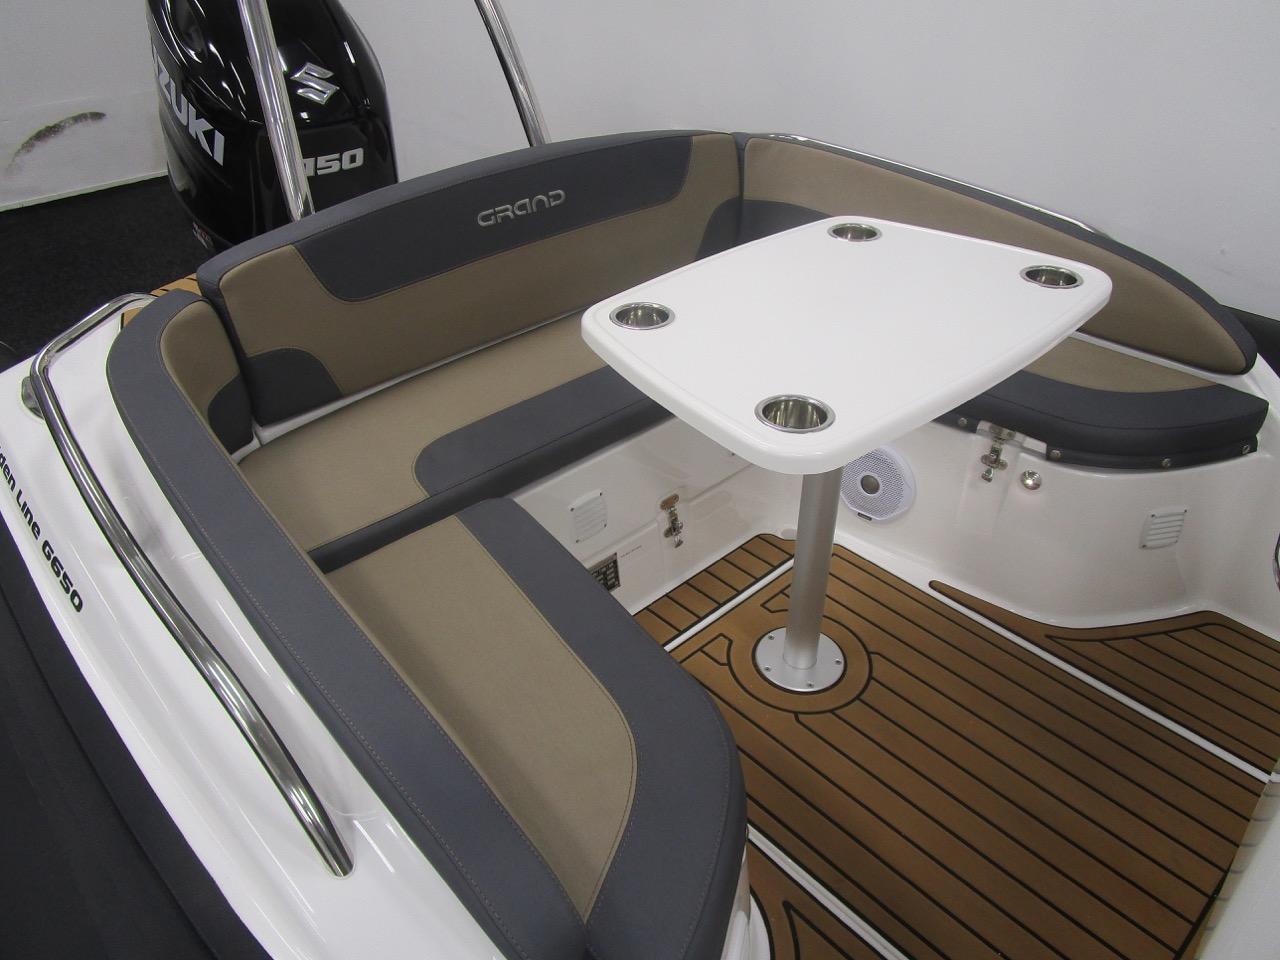 Grand RIB Golden Line G650 U-shaped seating